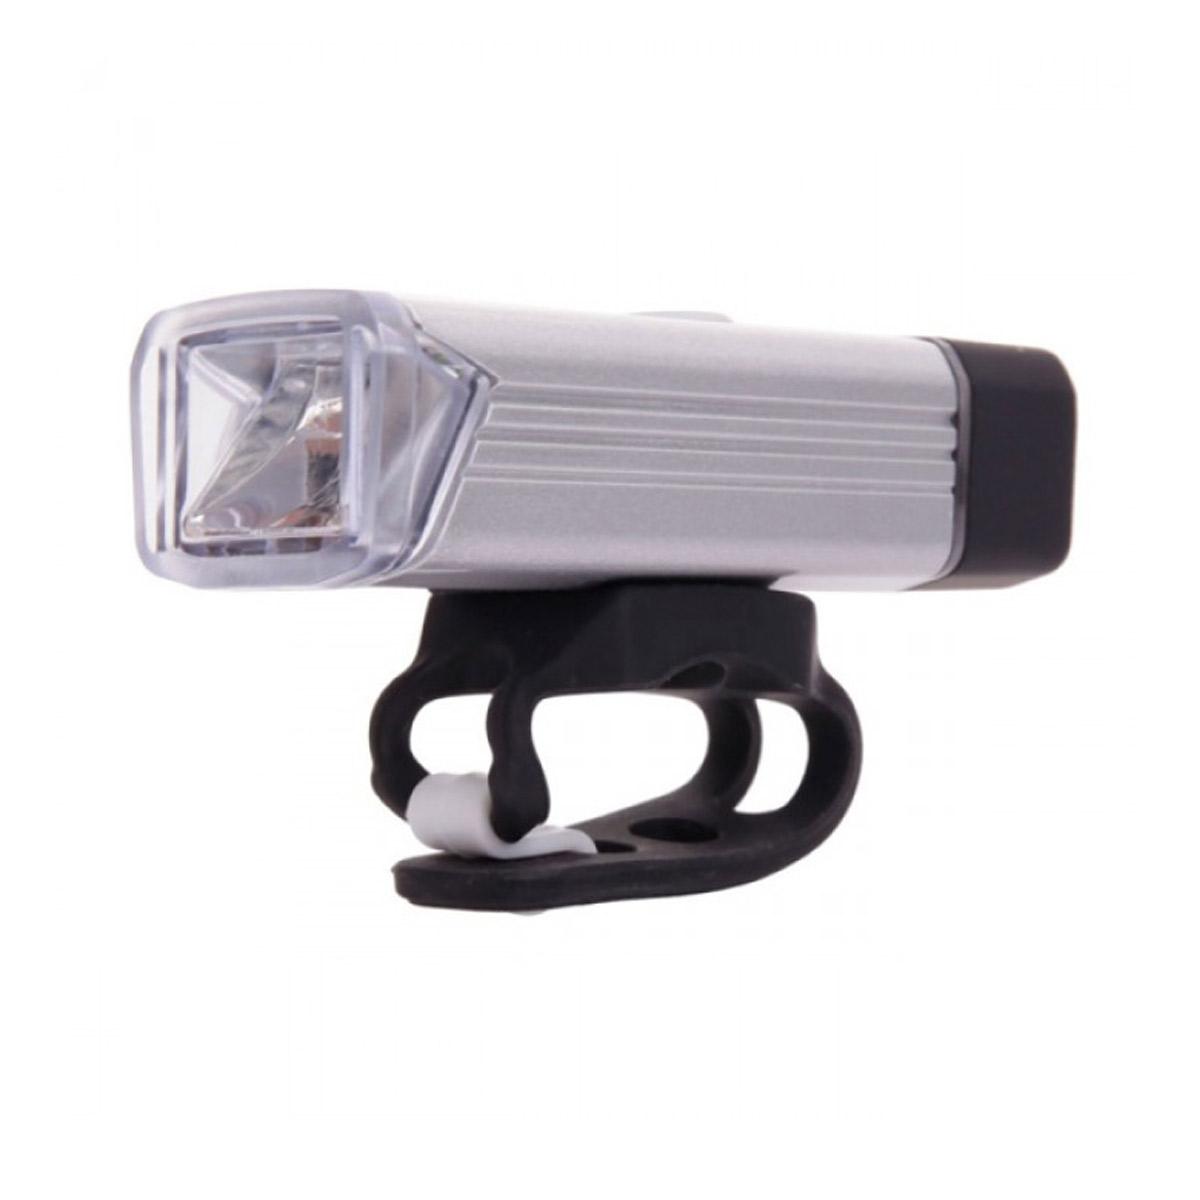 Фонари передние/задние LUMEN 180 Lumens USB Silver